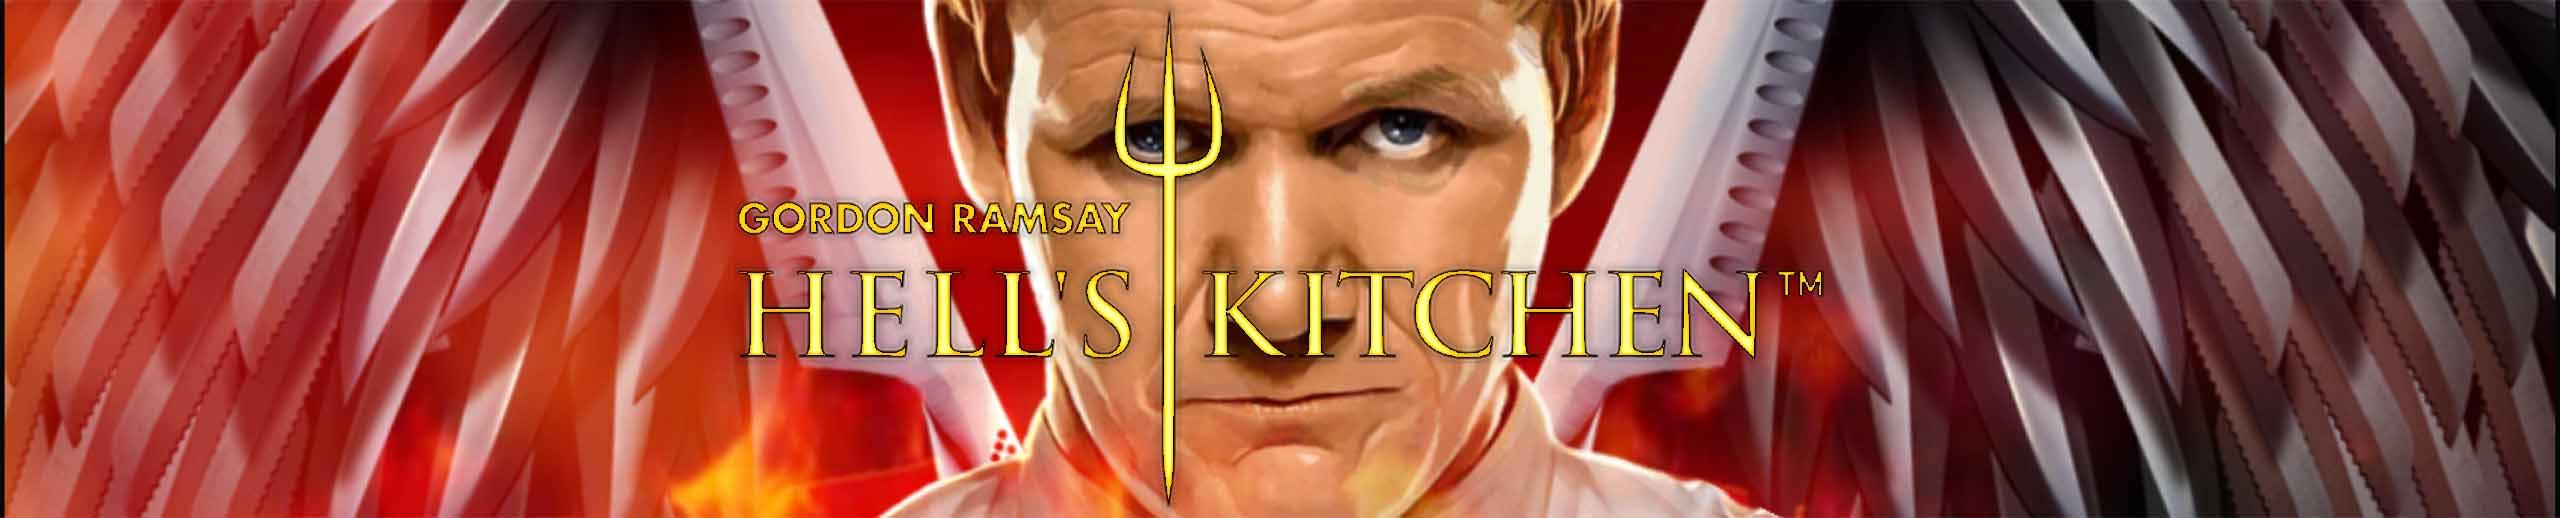 Hells Kitchen Slot Test